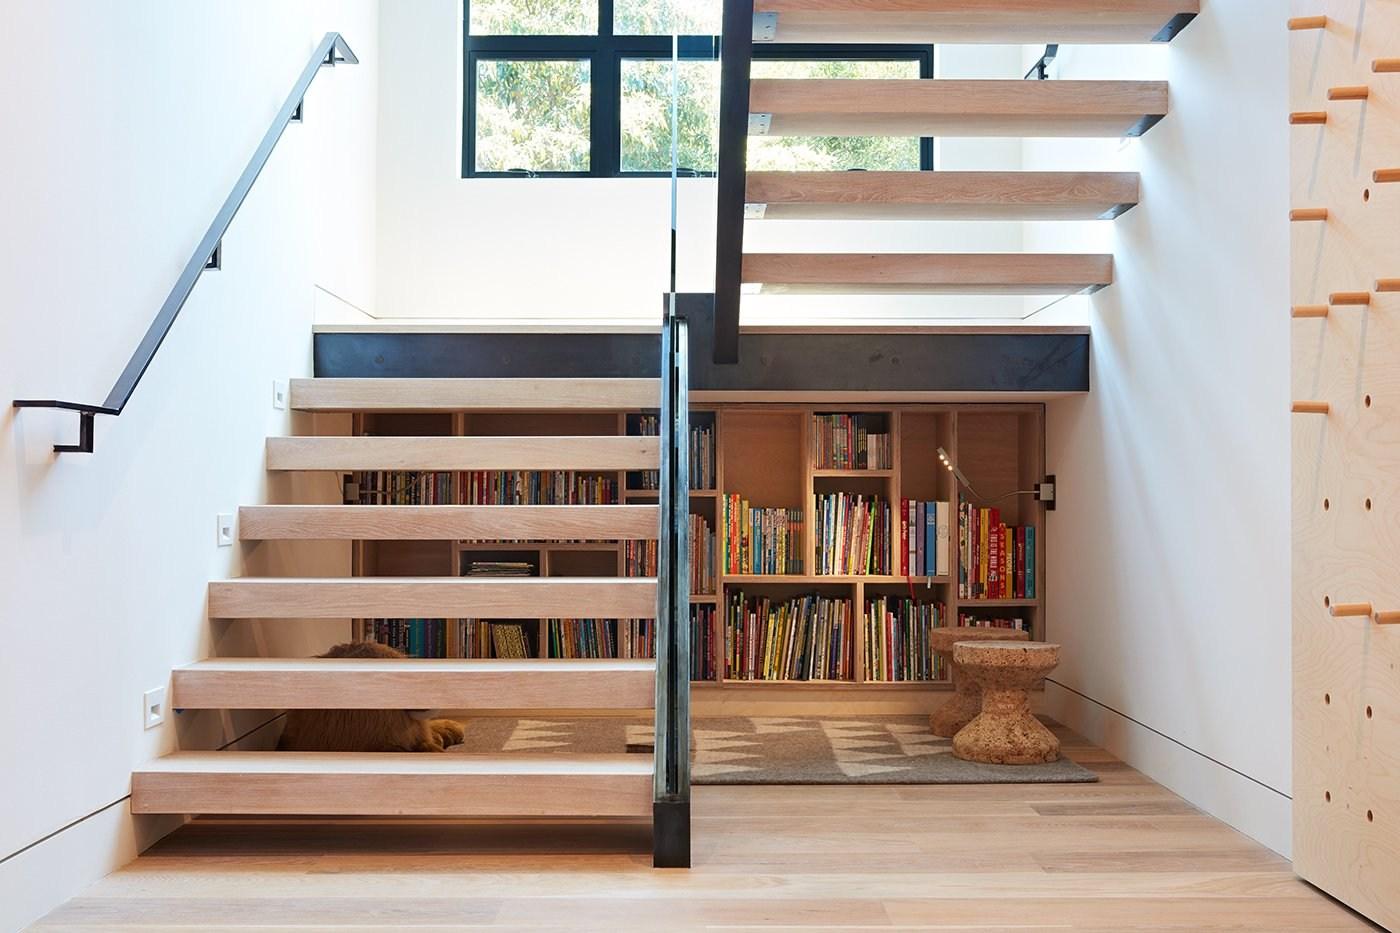 10 Smart And Surprising Under Stair Design Solutions Dwell   Interior Design Under Staircase   Ideas   Cupboard   Indoor Garden   Spiral Staircase   Shelves